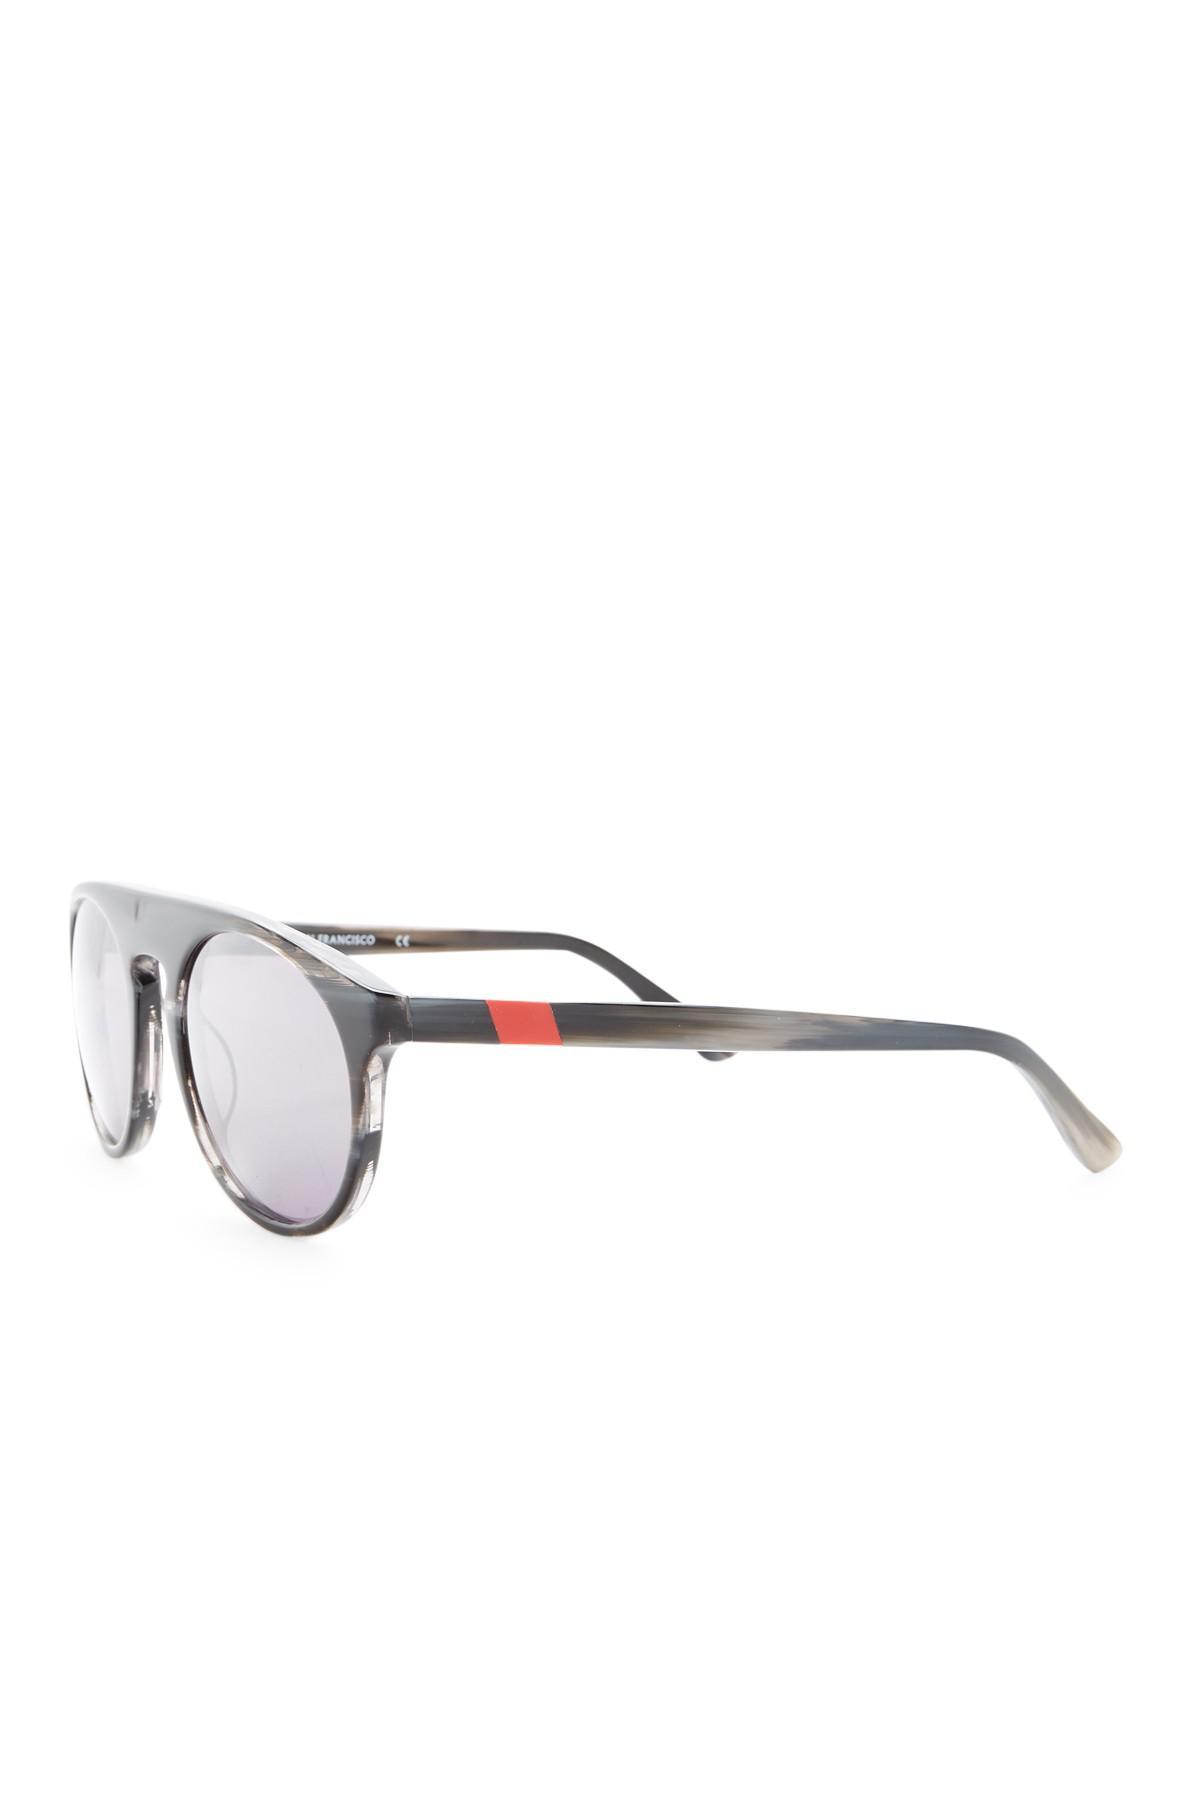 2aec7f69c5 Westward Leaning Atlas Oversized Sunglasses - Lyst